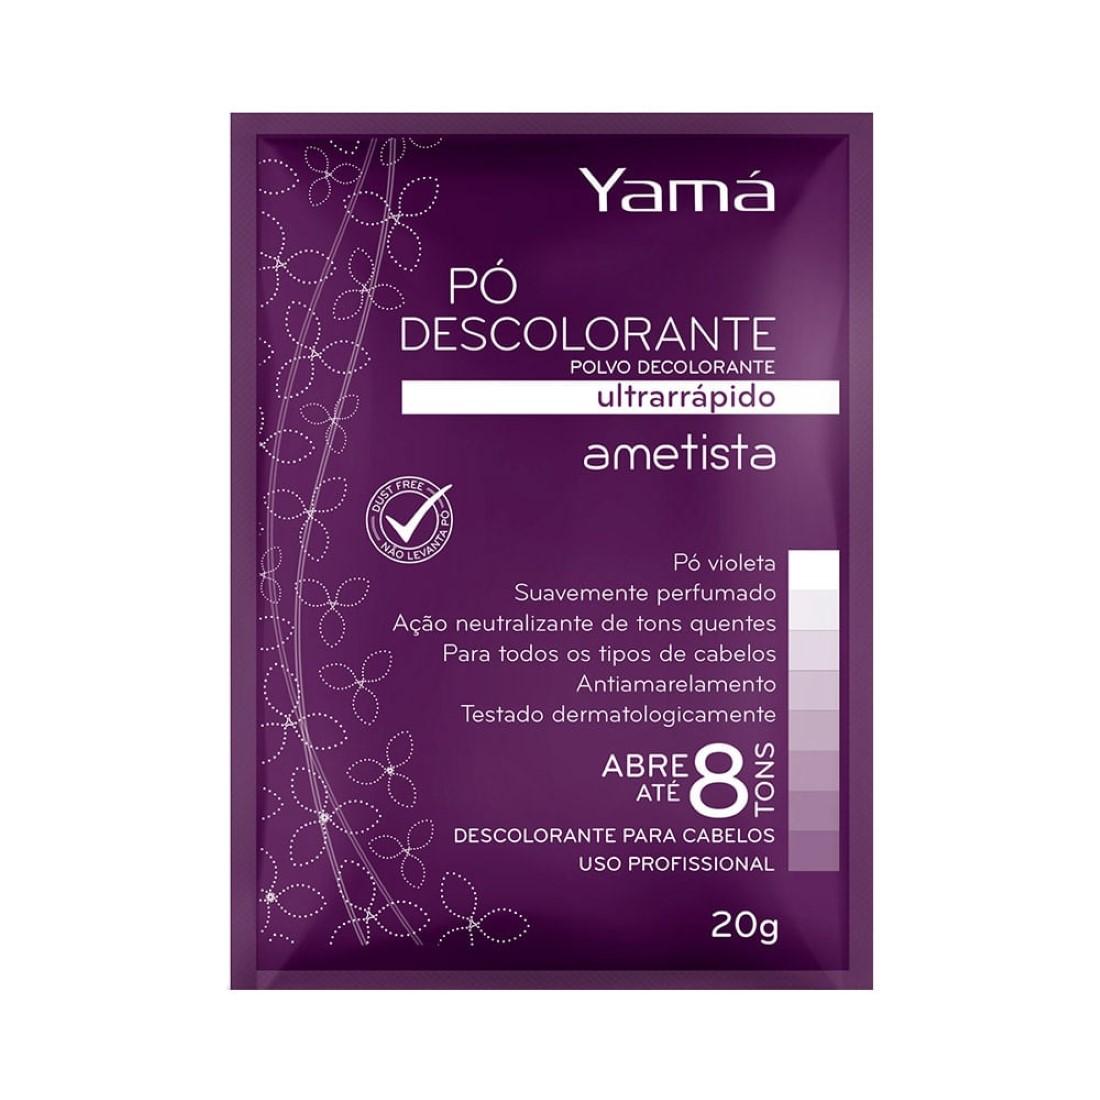 Pó Descolorante Ultra Rápido Ametista 20g - Yamá